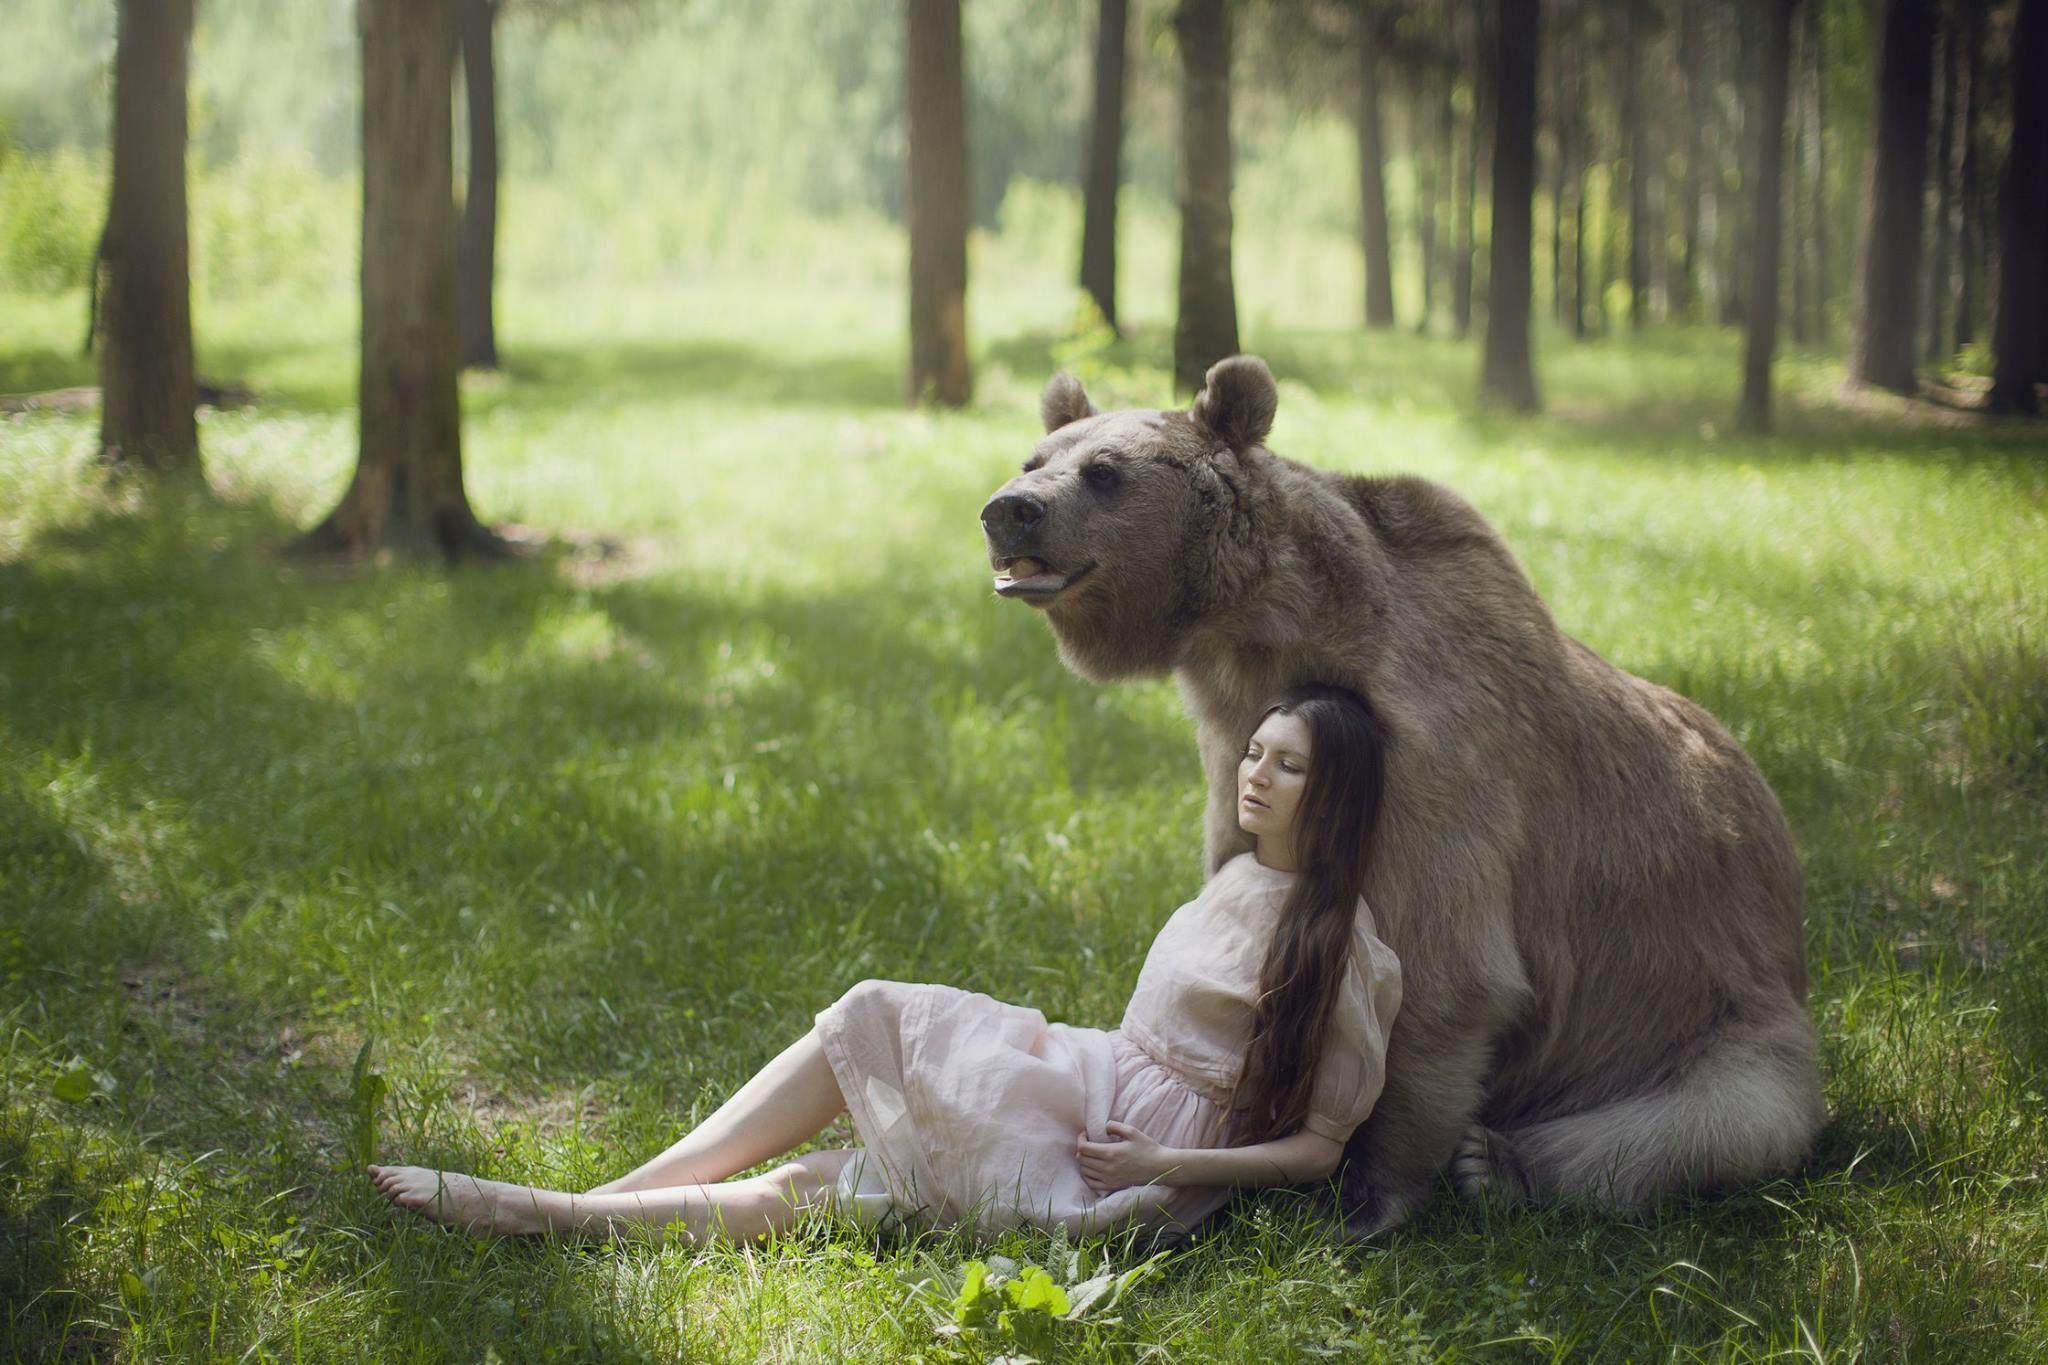 Russian Photographer Takes Stunning Fairytale Images With Wild - Photographer captures fairytale like portraits women animals